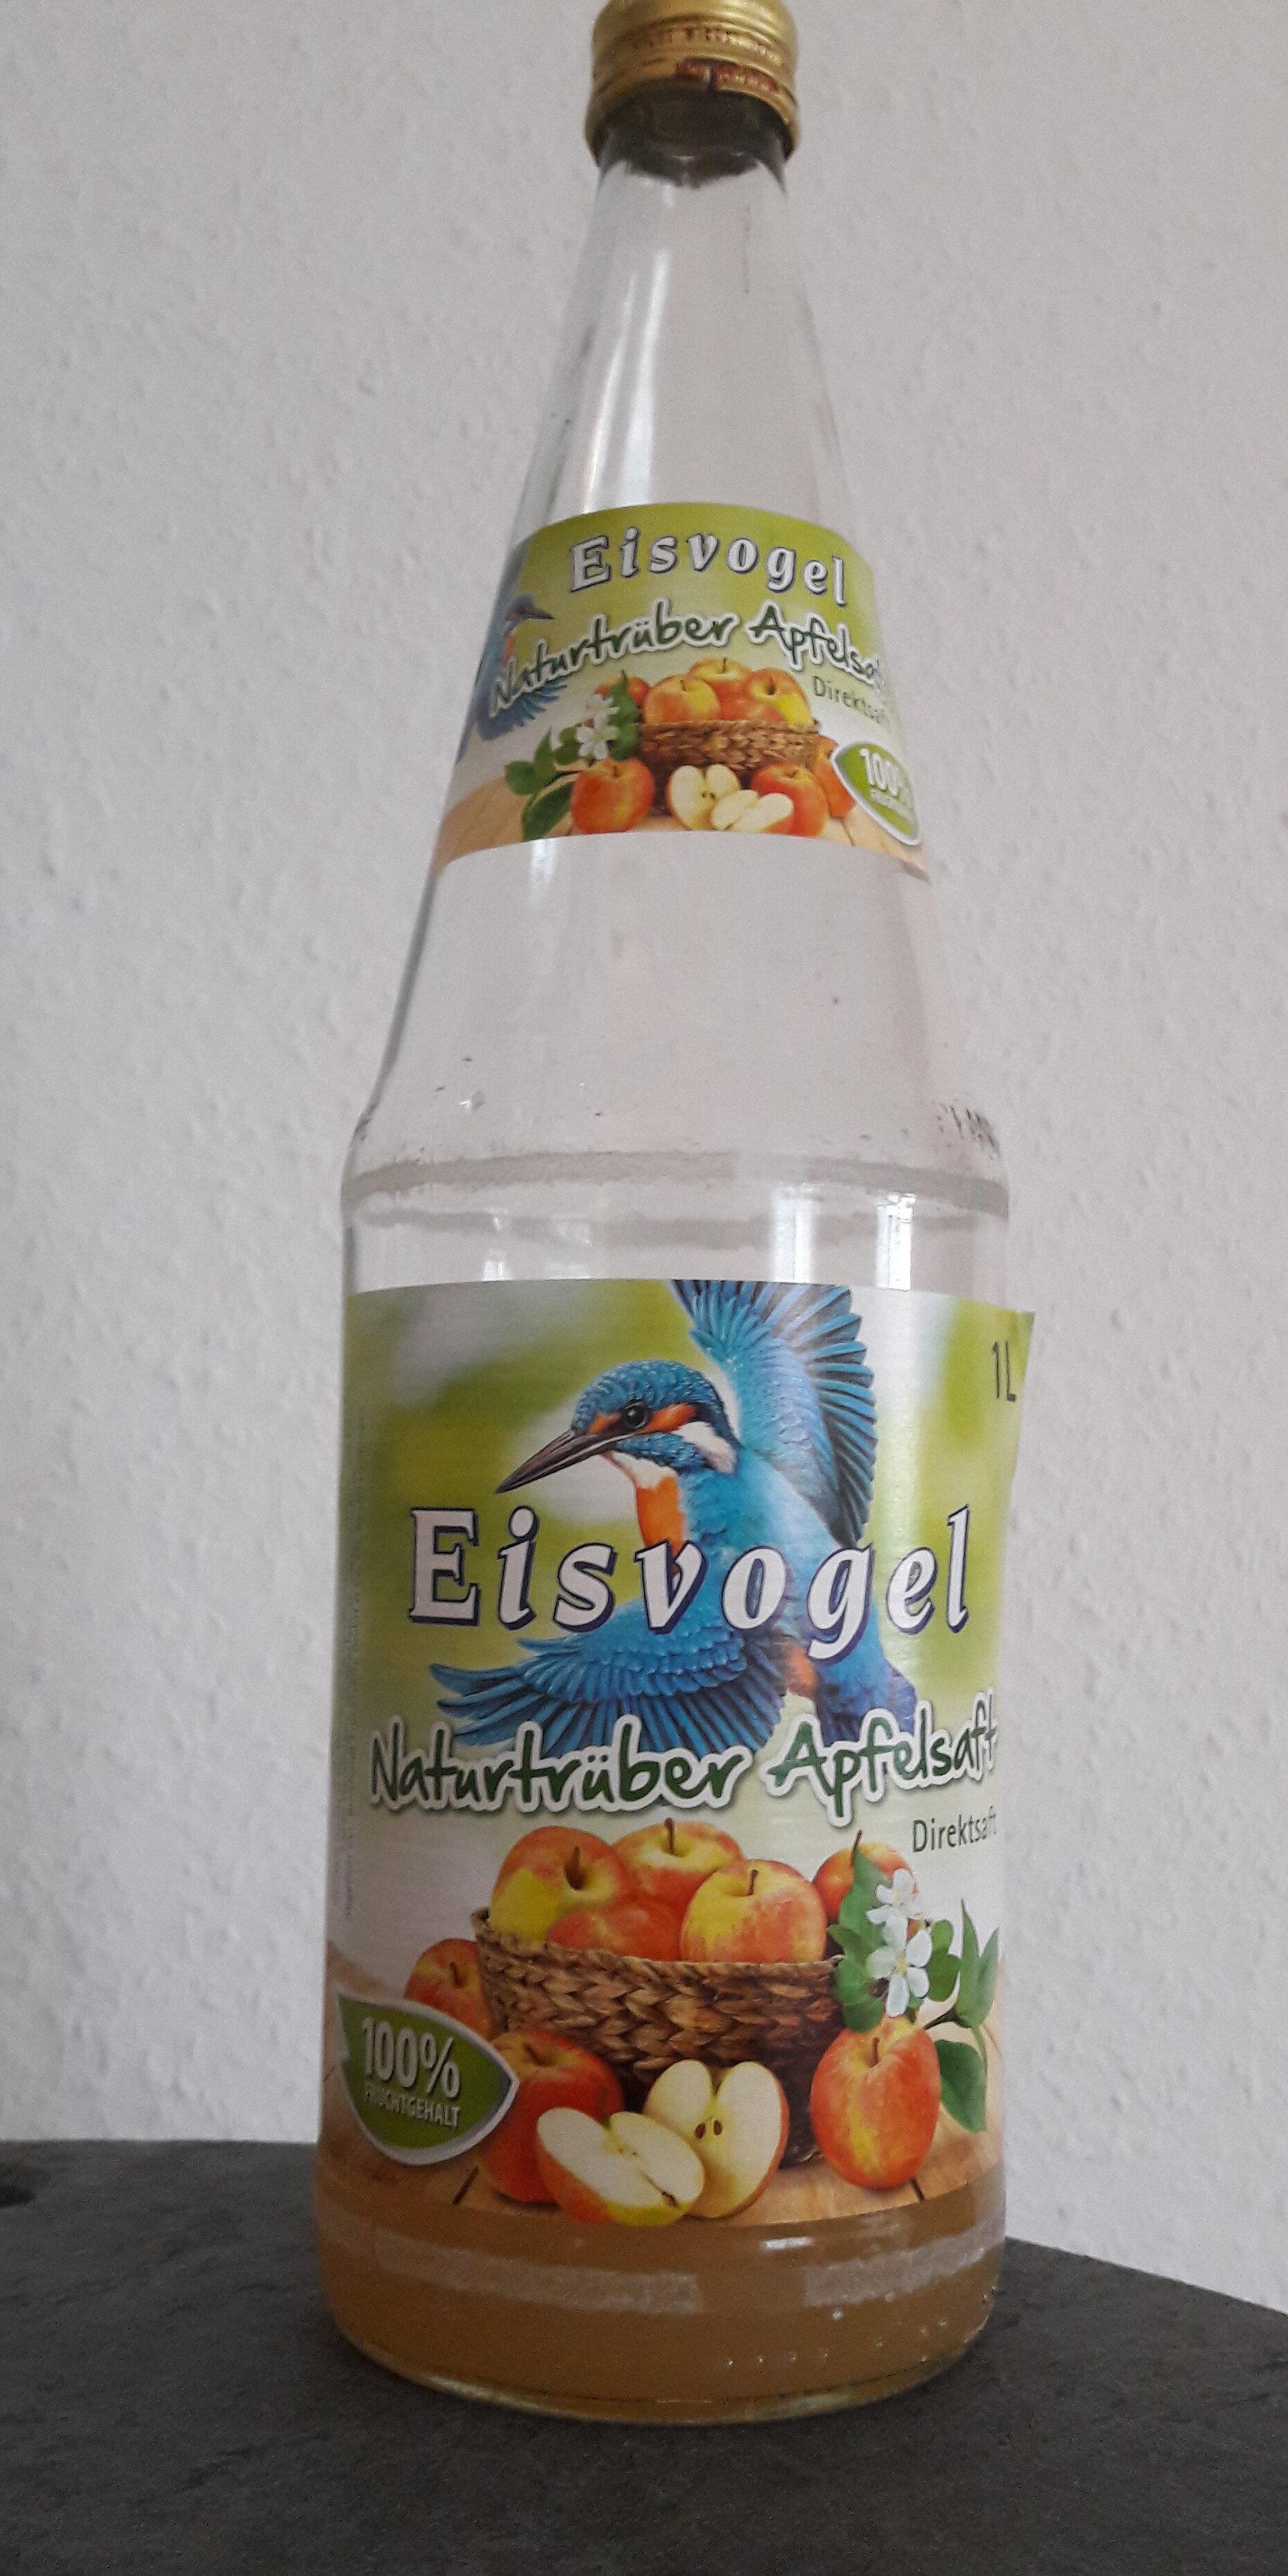 Naturtrüber Apfelsaft - Product - de